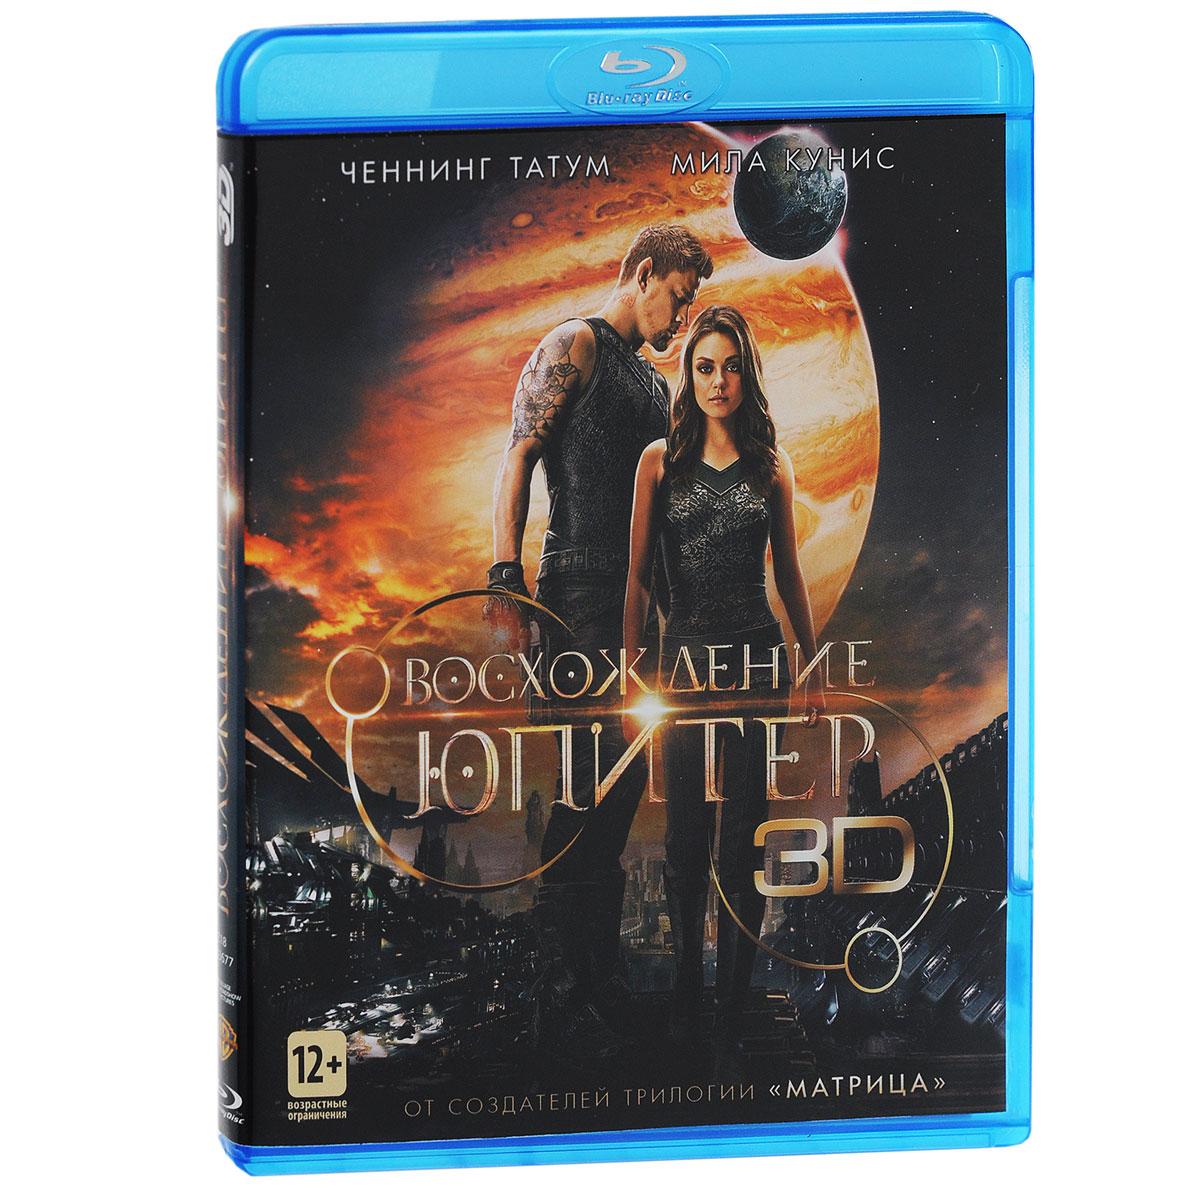 Восхождение Юпитер 3D и 2D (2 Blu-ray) 2015 2 3D Blu-ray + 2D Blu-ray